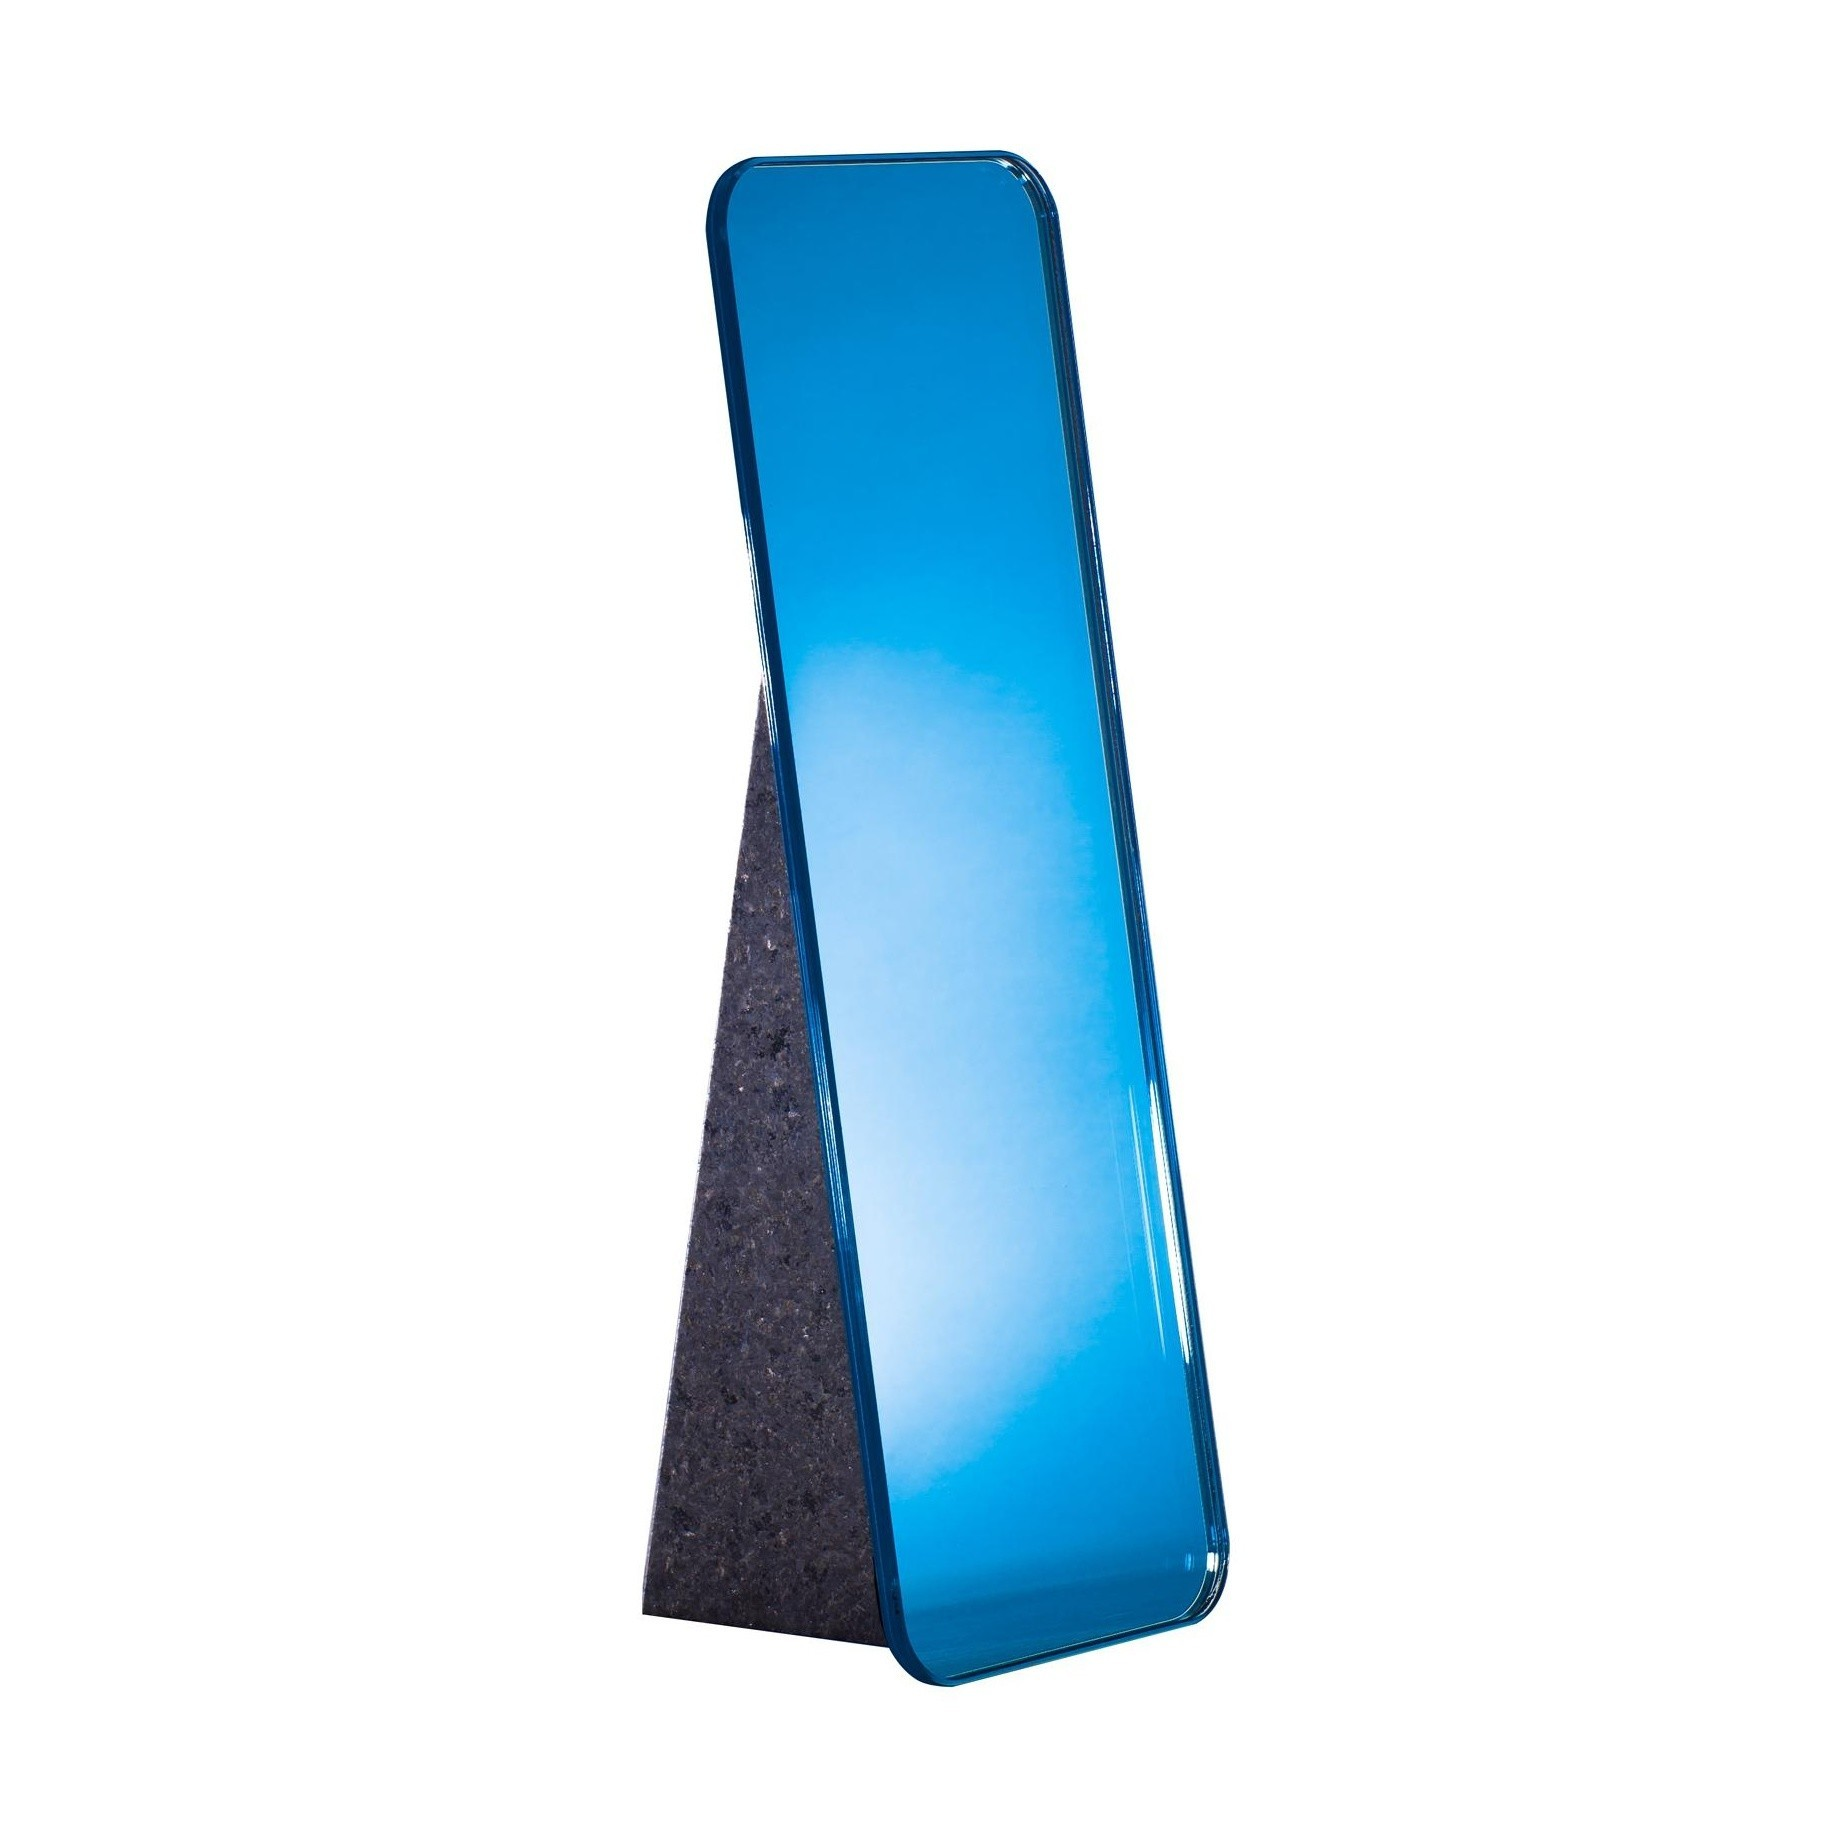 Pulpo Olivia Table Mirror H 38cm Cobalt Blue Pedestal